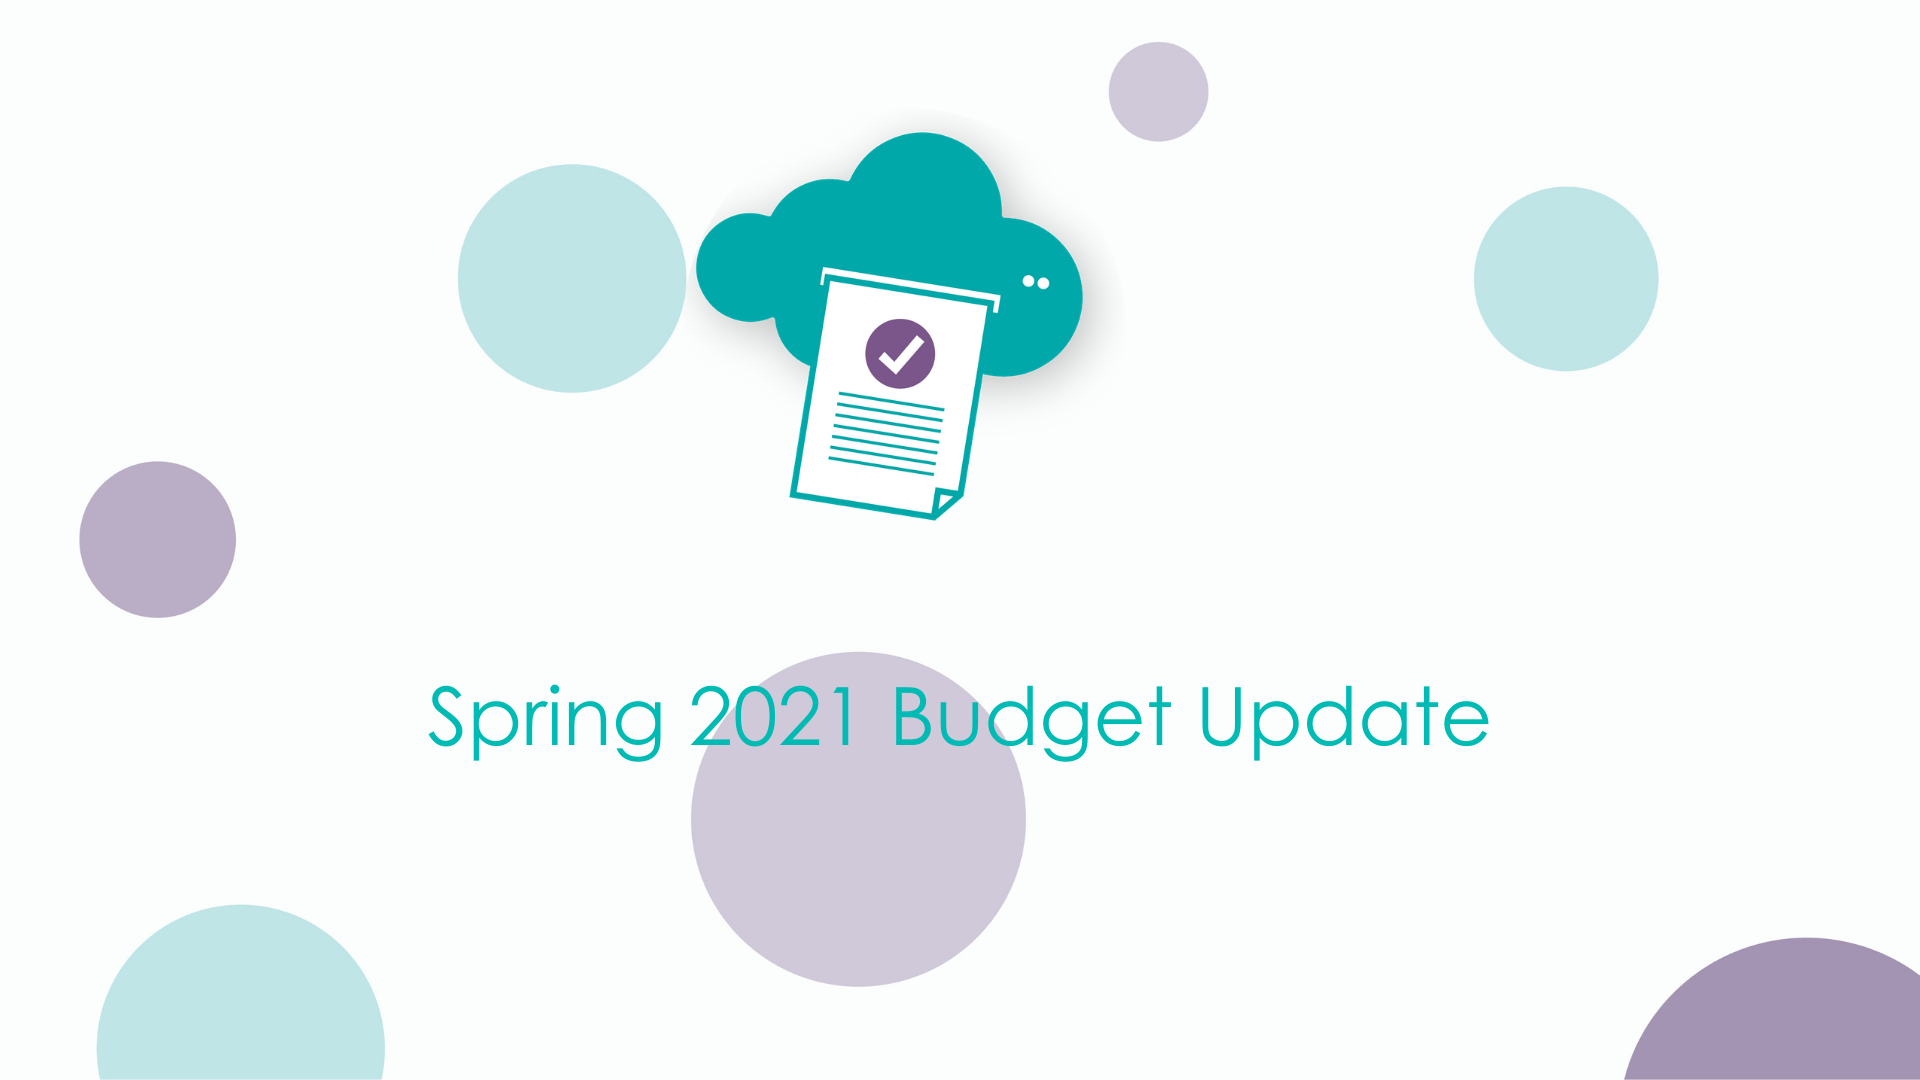 Spring 2021 Budget Update